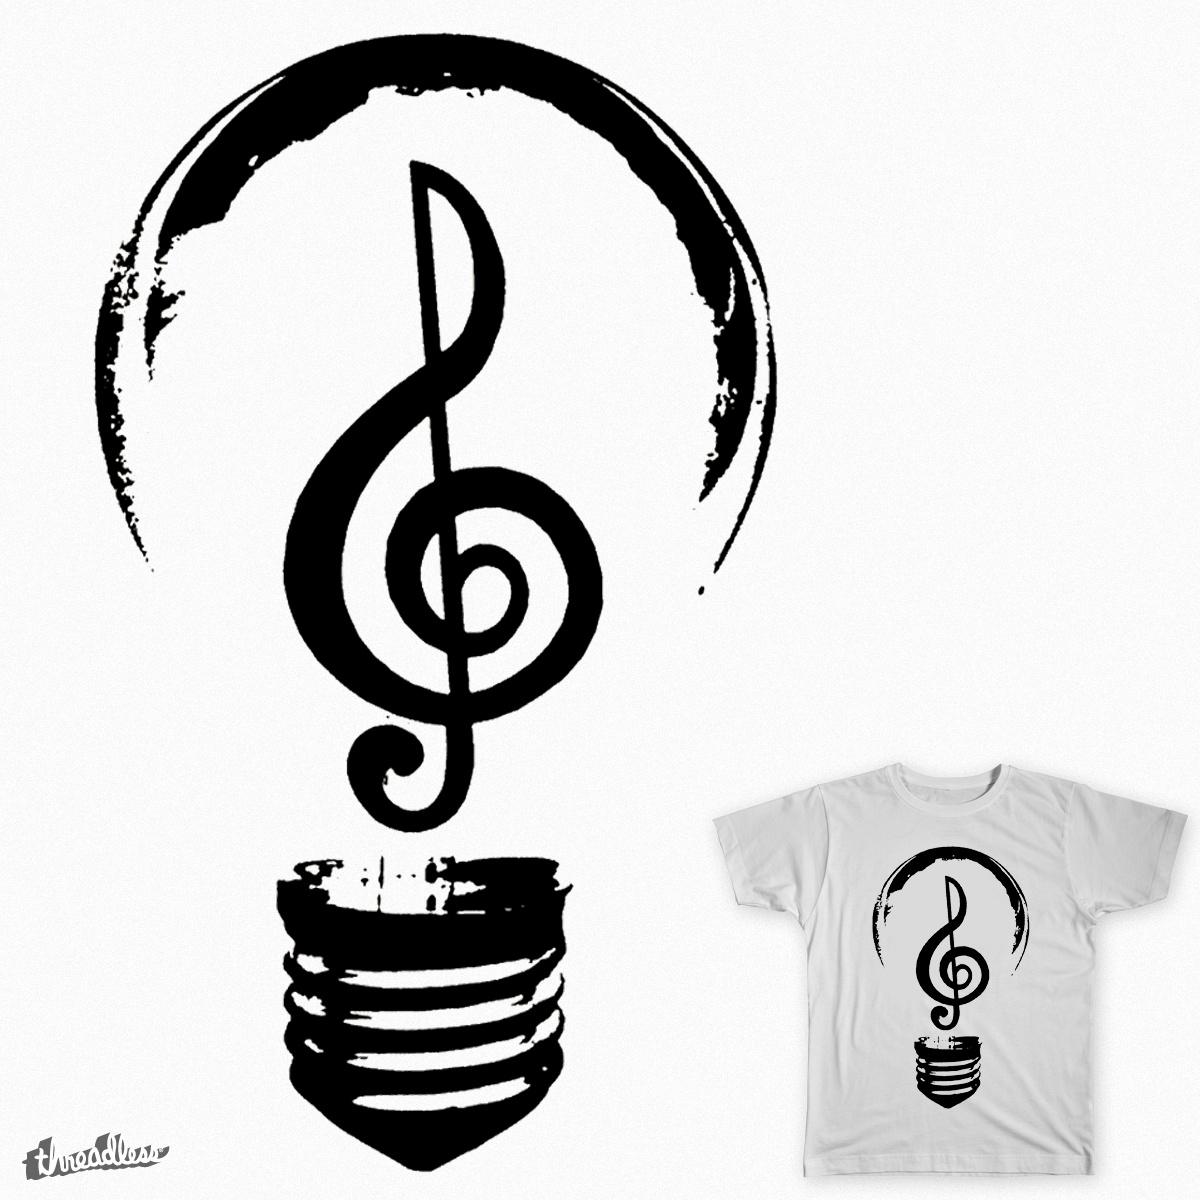 Music is Light by Birdstick on Threadless